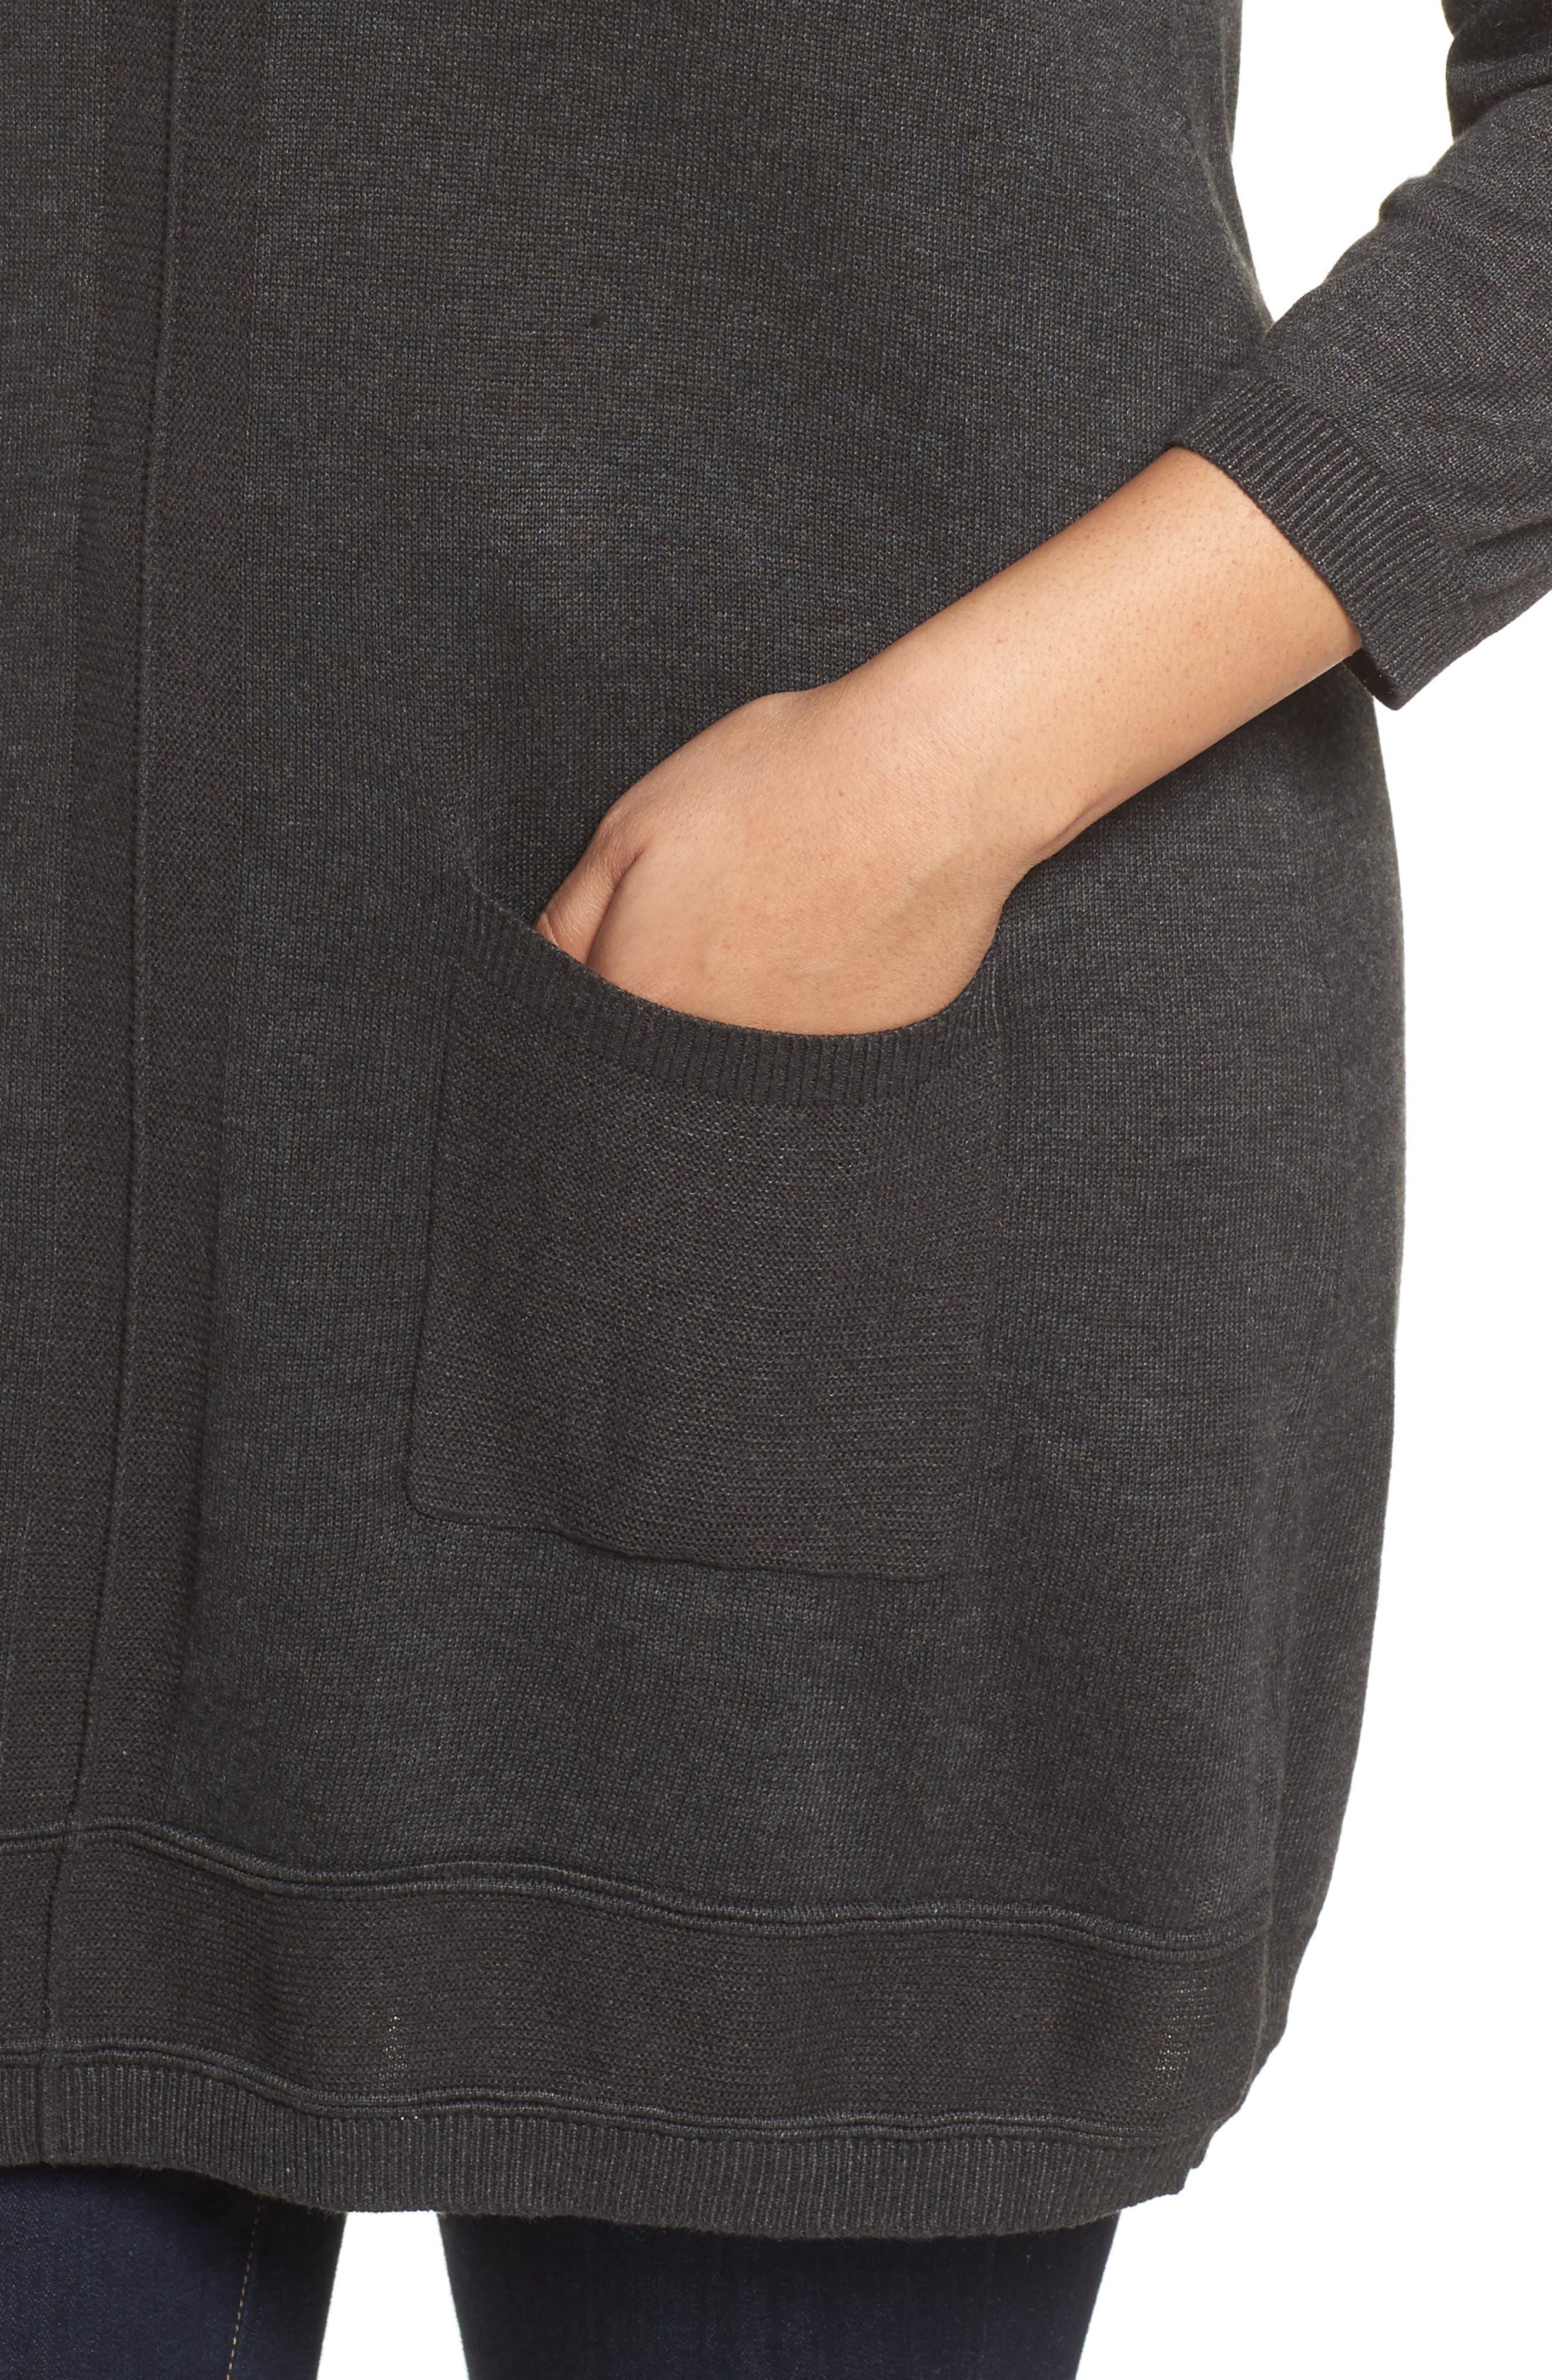 Pocket Tunic Sweater,                             Alternate thumbnail 4, color,